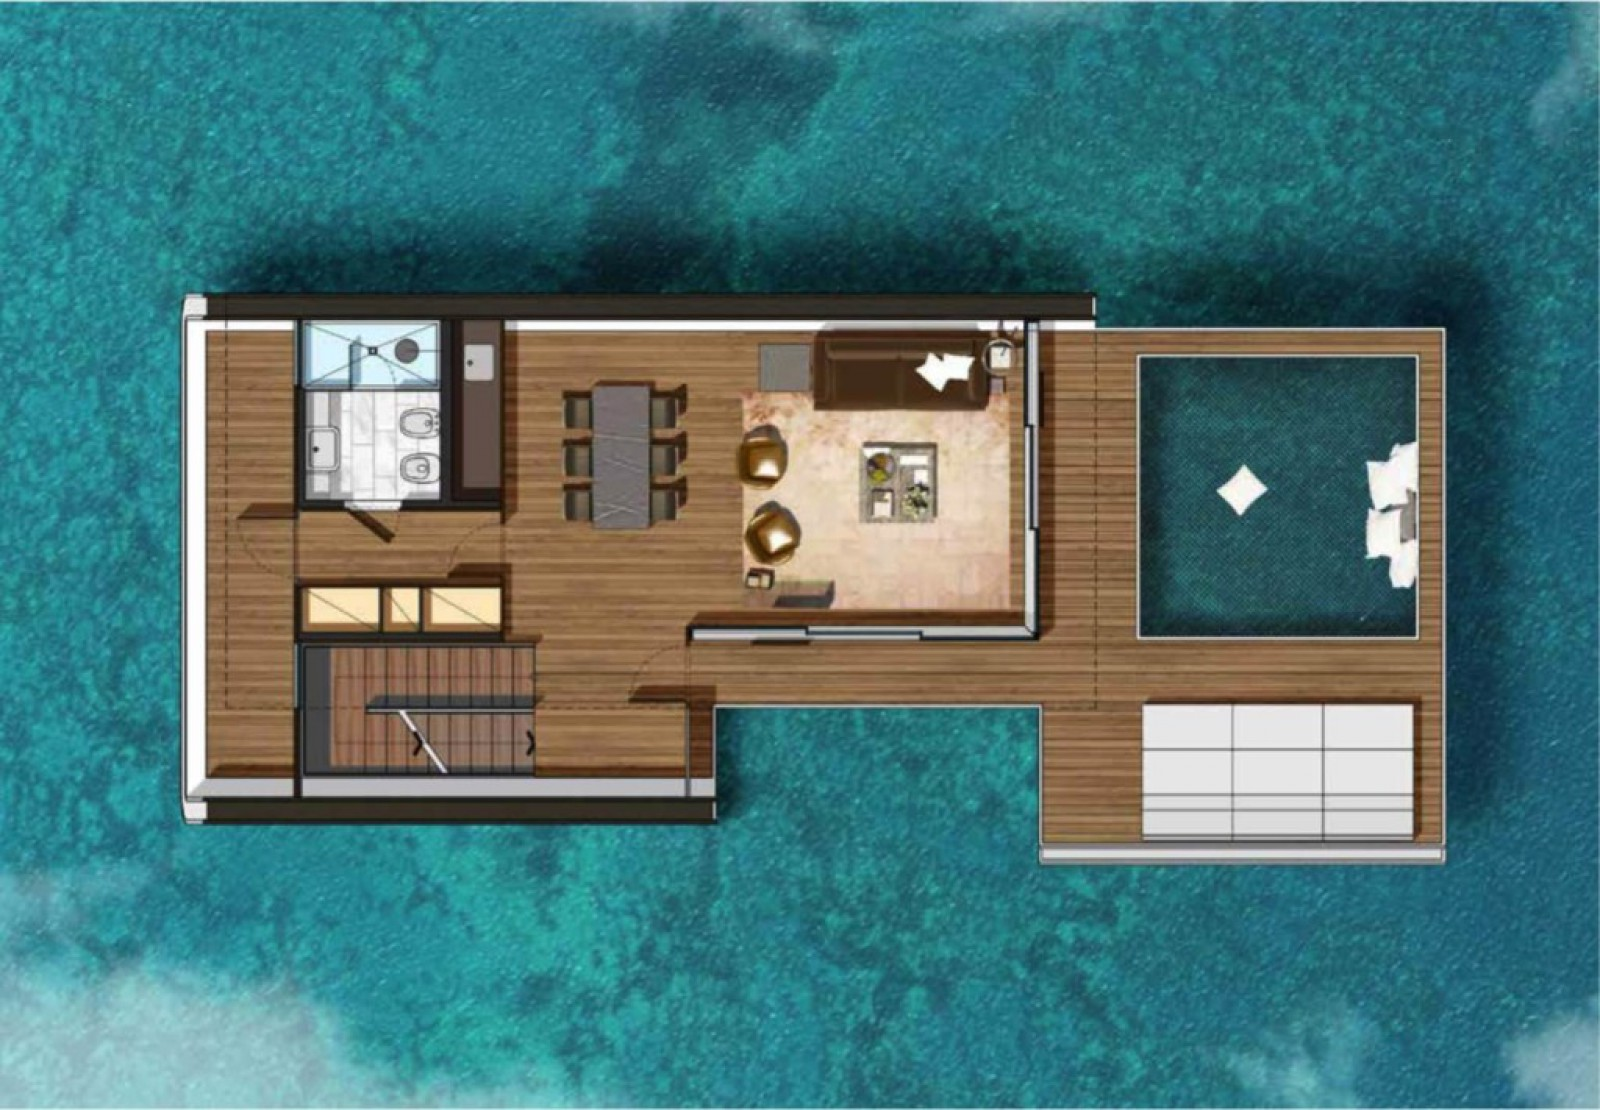 floating_seahorse_house_dubai_9_1024x711_copy